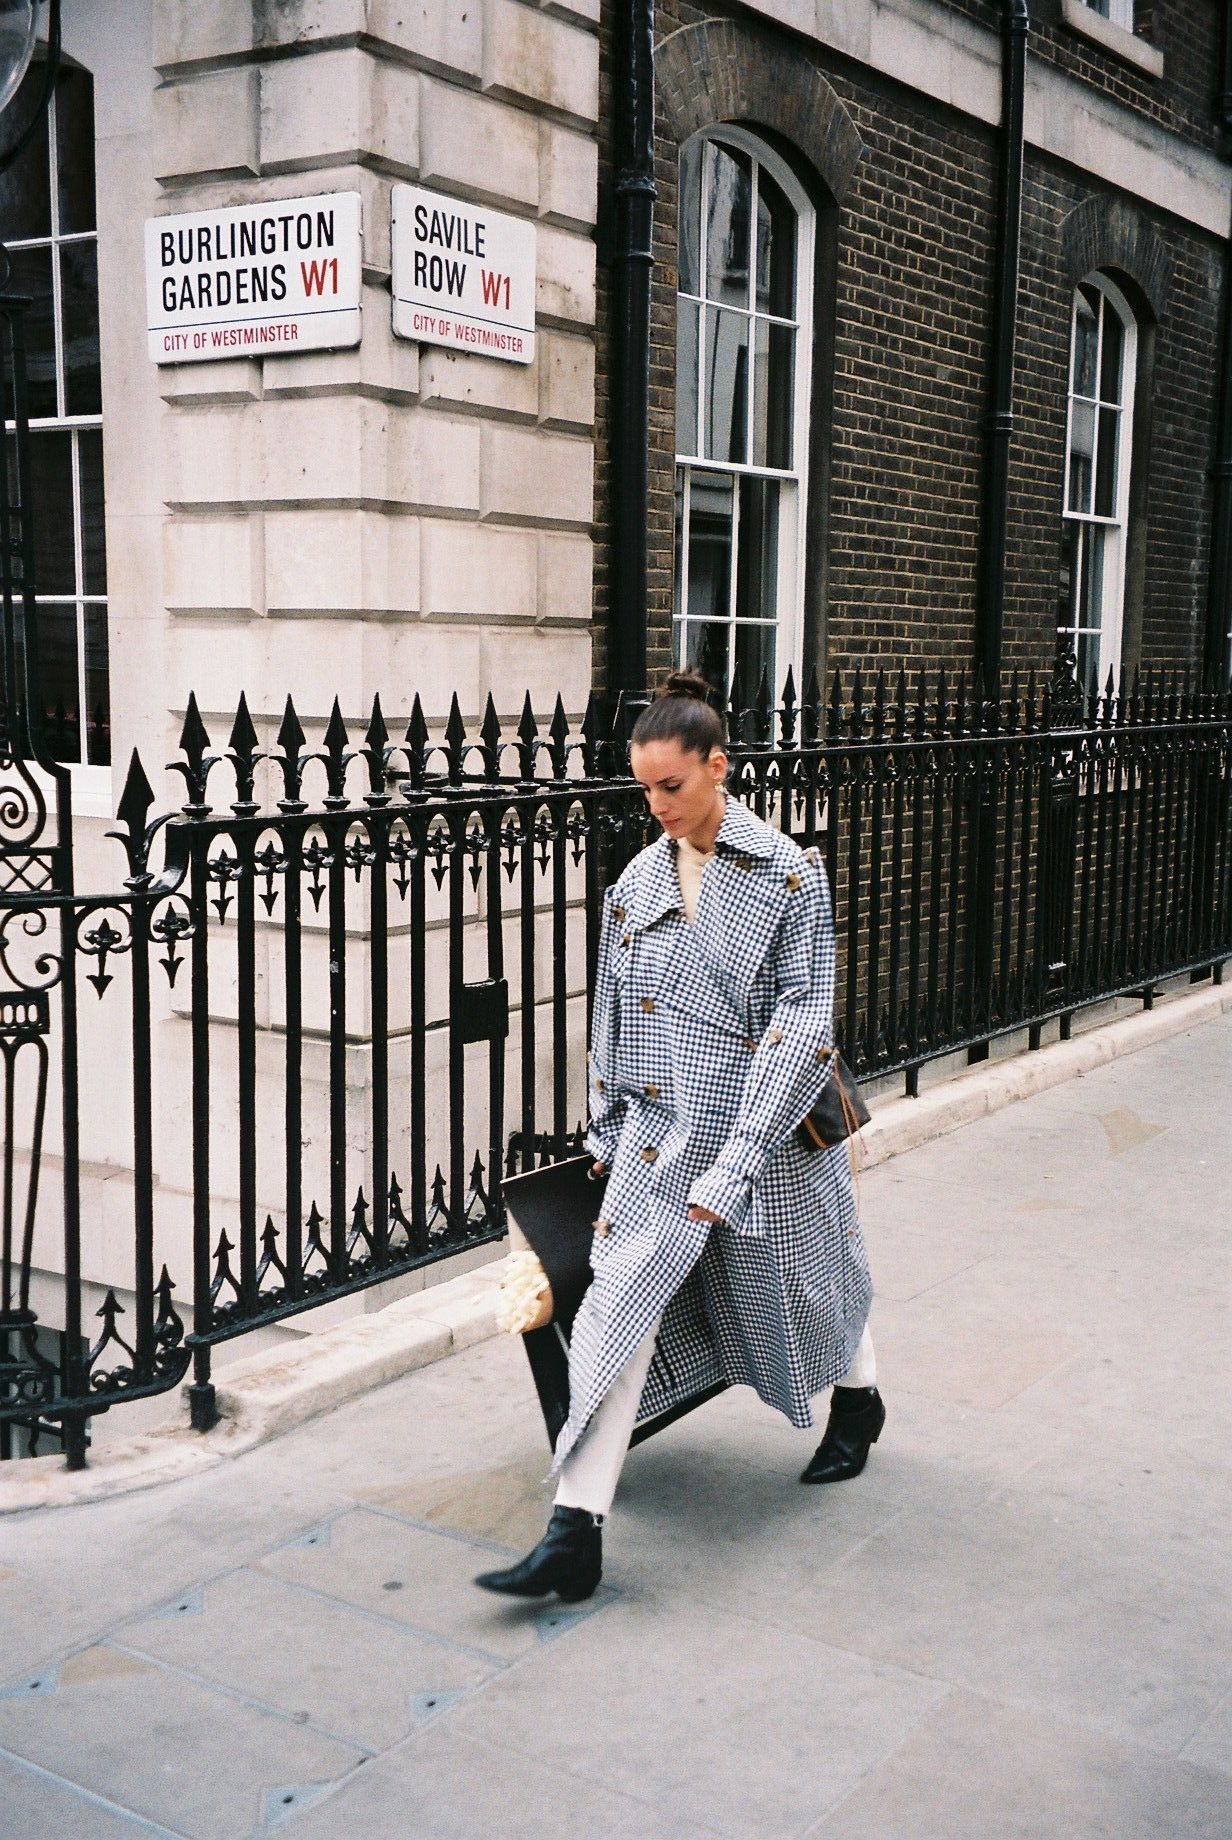 Wearing my favourite coat while doing some shopping for our new house . / A usar o meu casaco preferido durante um dia de compras para a casa nova.